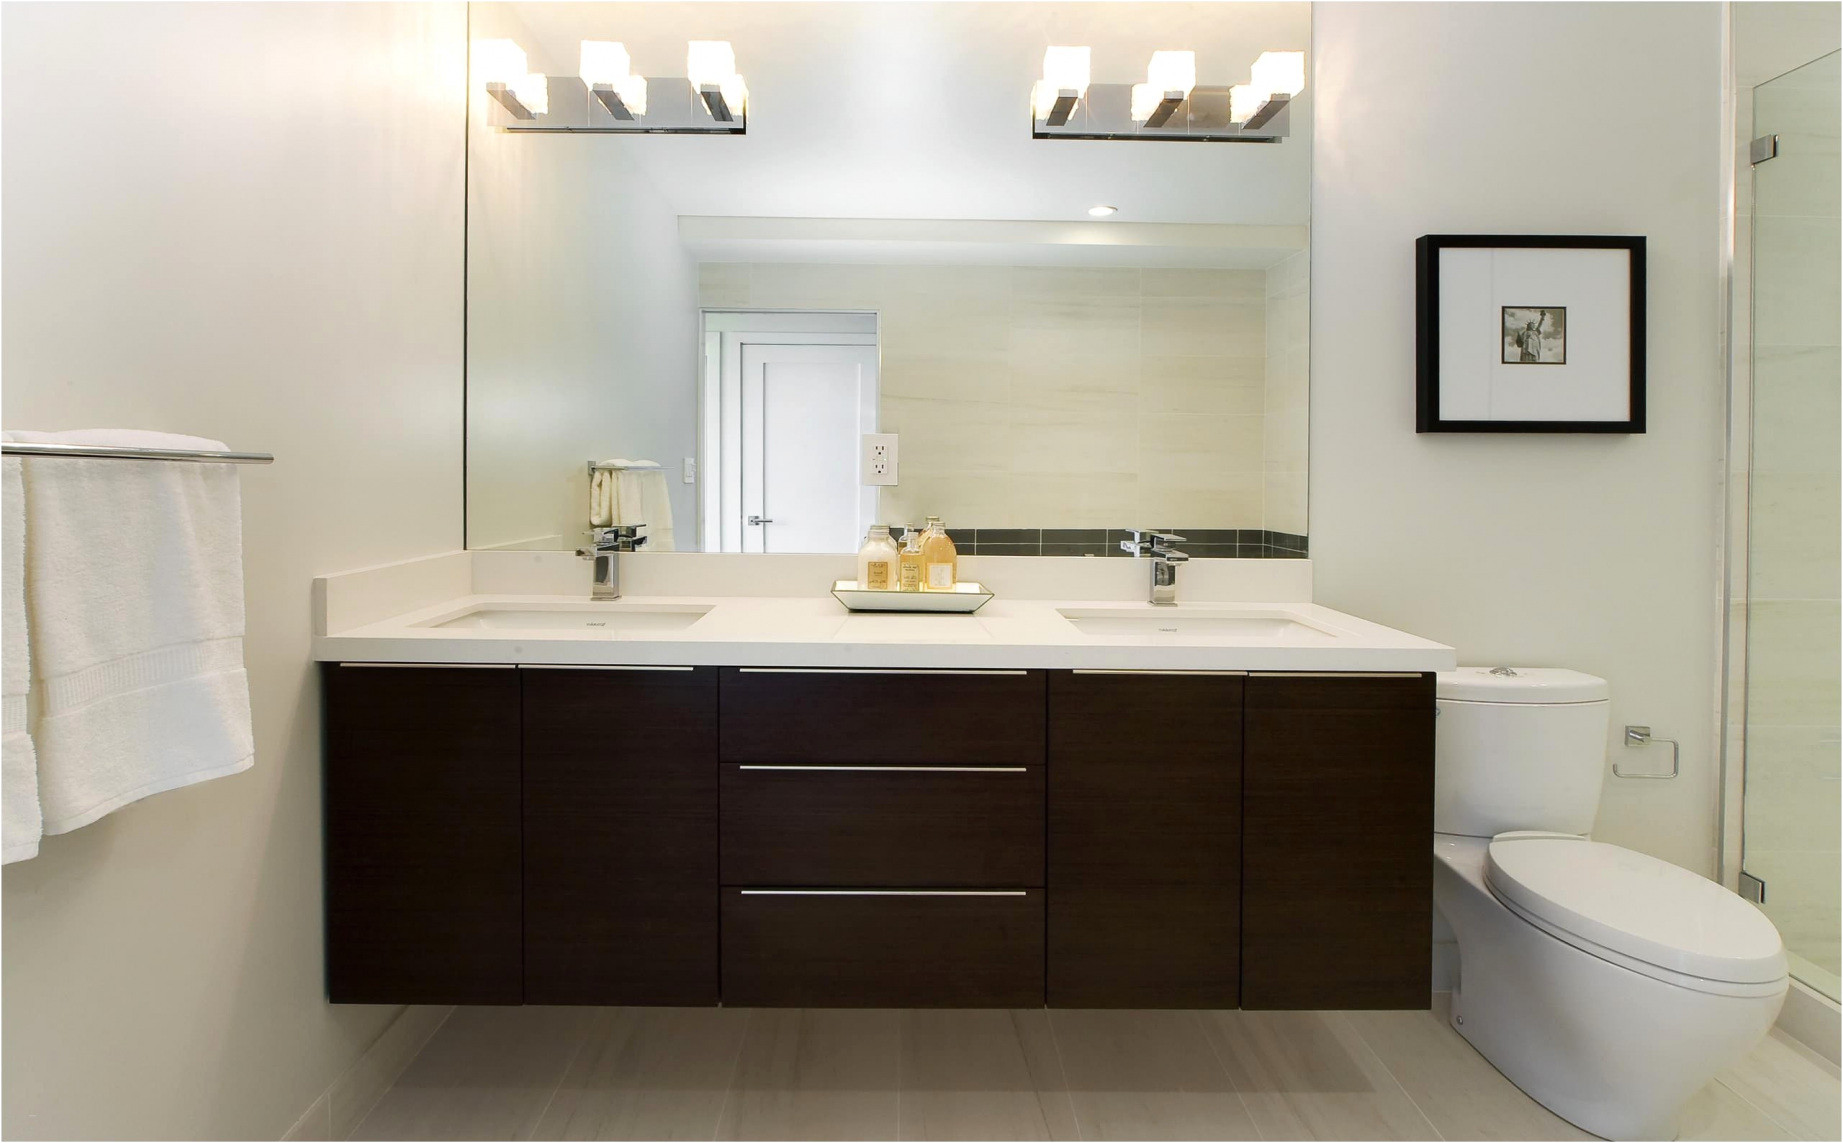 prepossessing sink furniture cabinet or most useful kitchen sinks cabinets freestanding